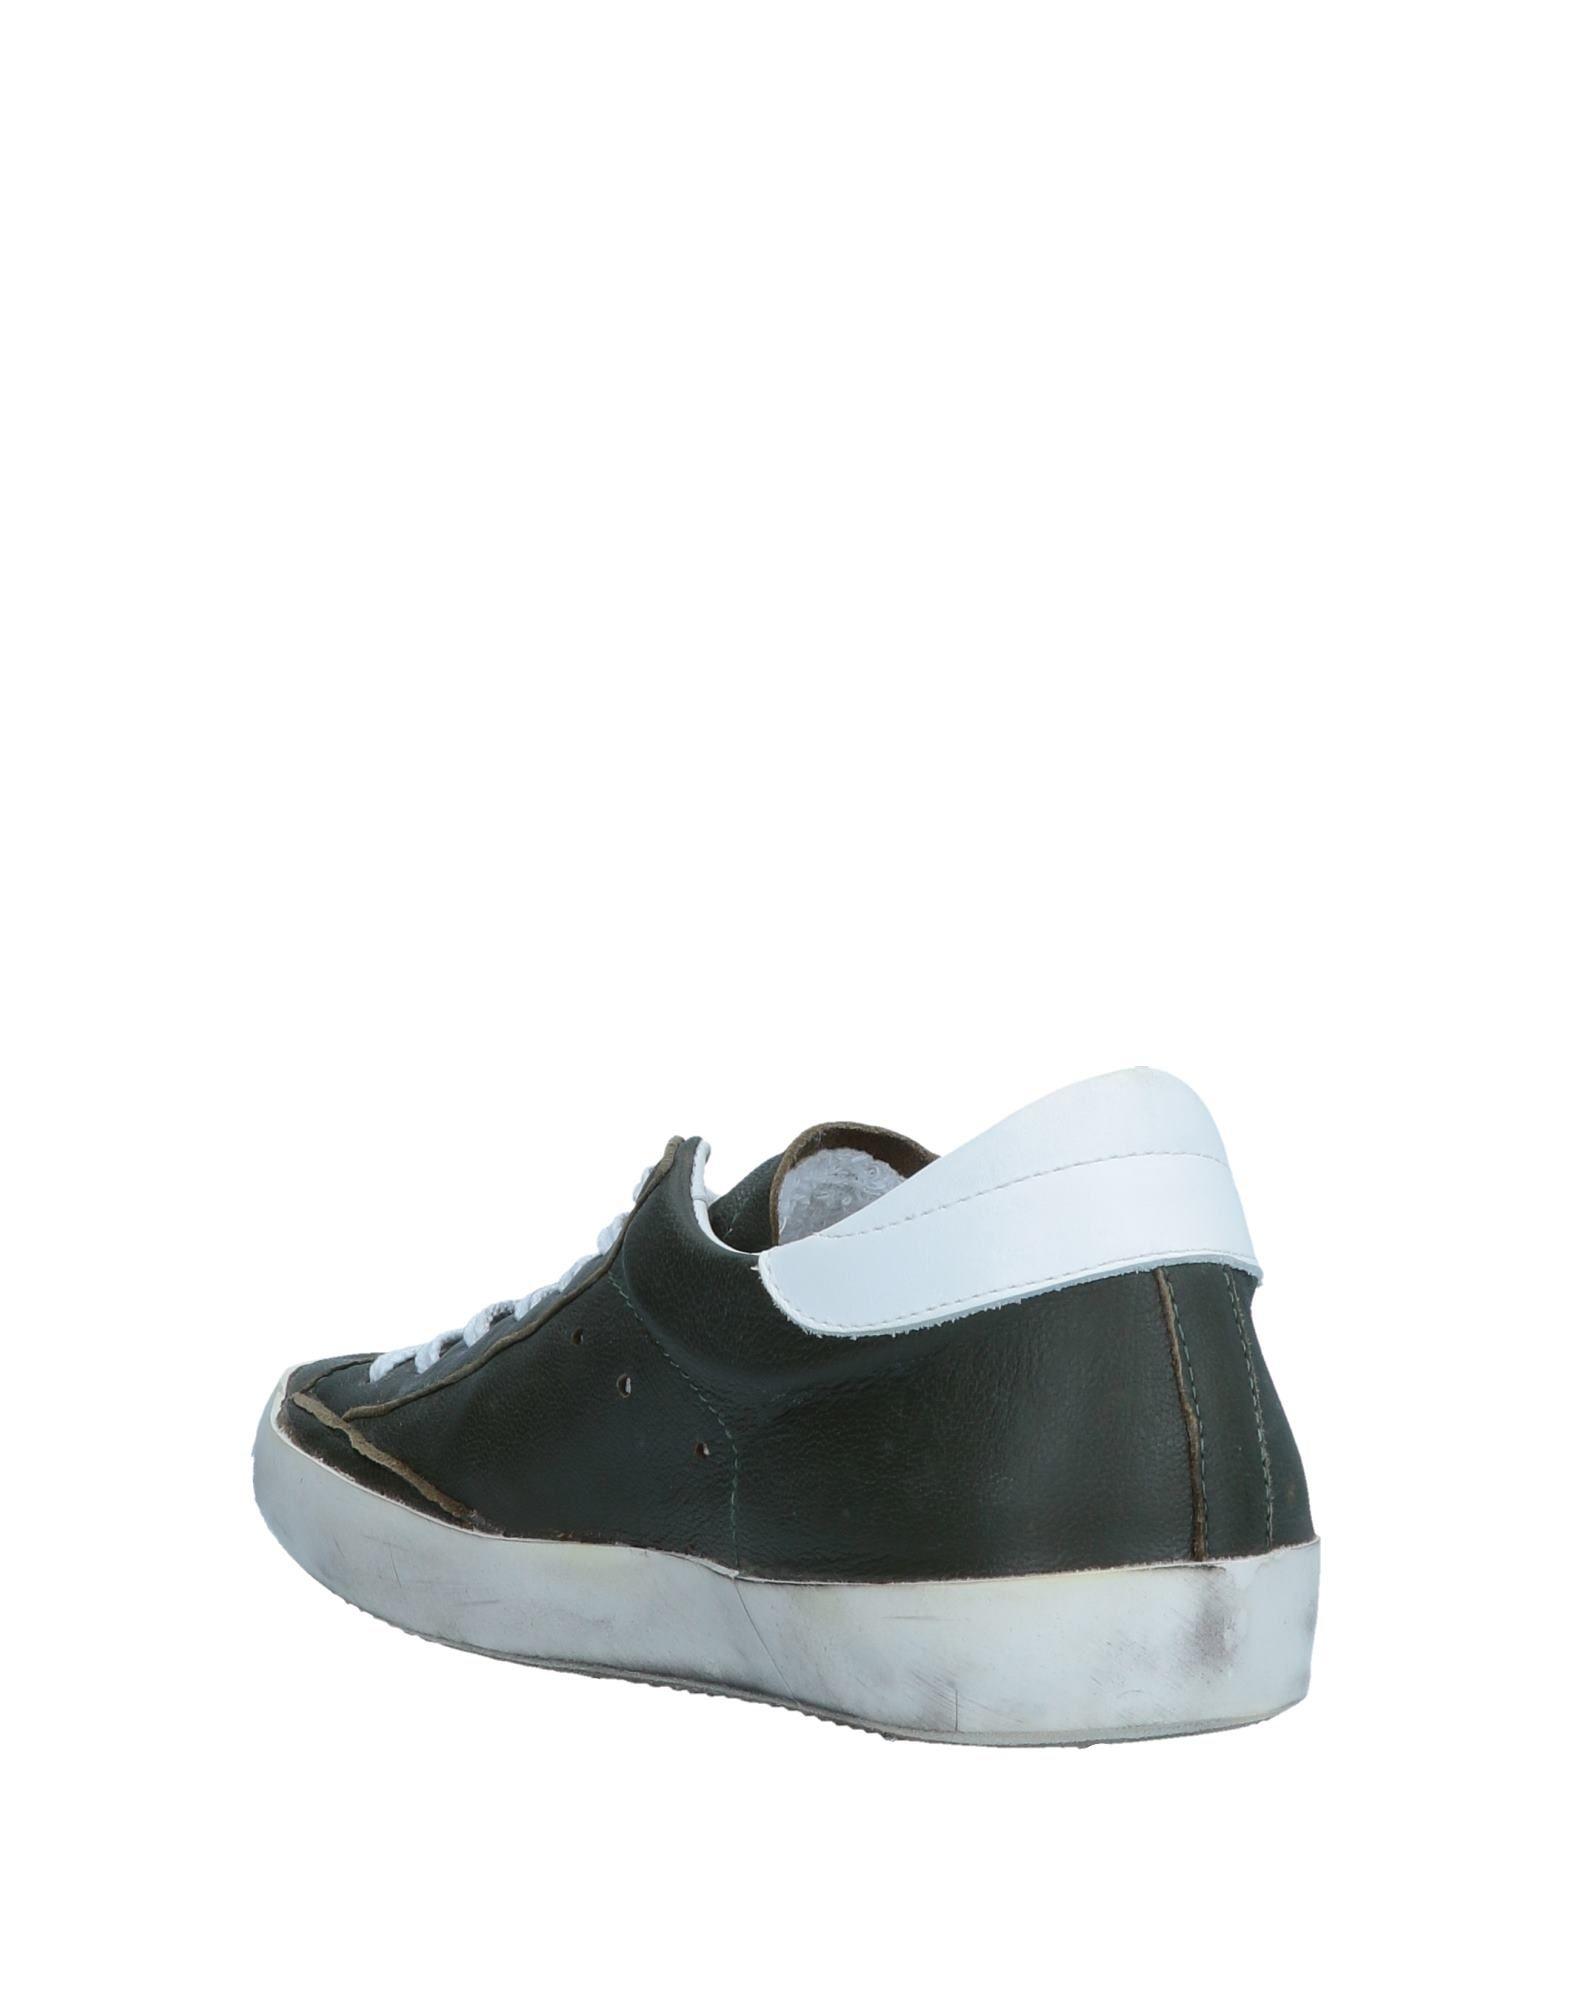 Philippe Model Sneakers Herren  Schuhe 11552659QQ Gute Qualität beliebte Schuhe  5ec5d7